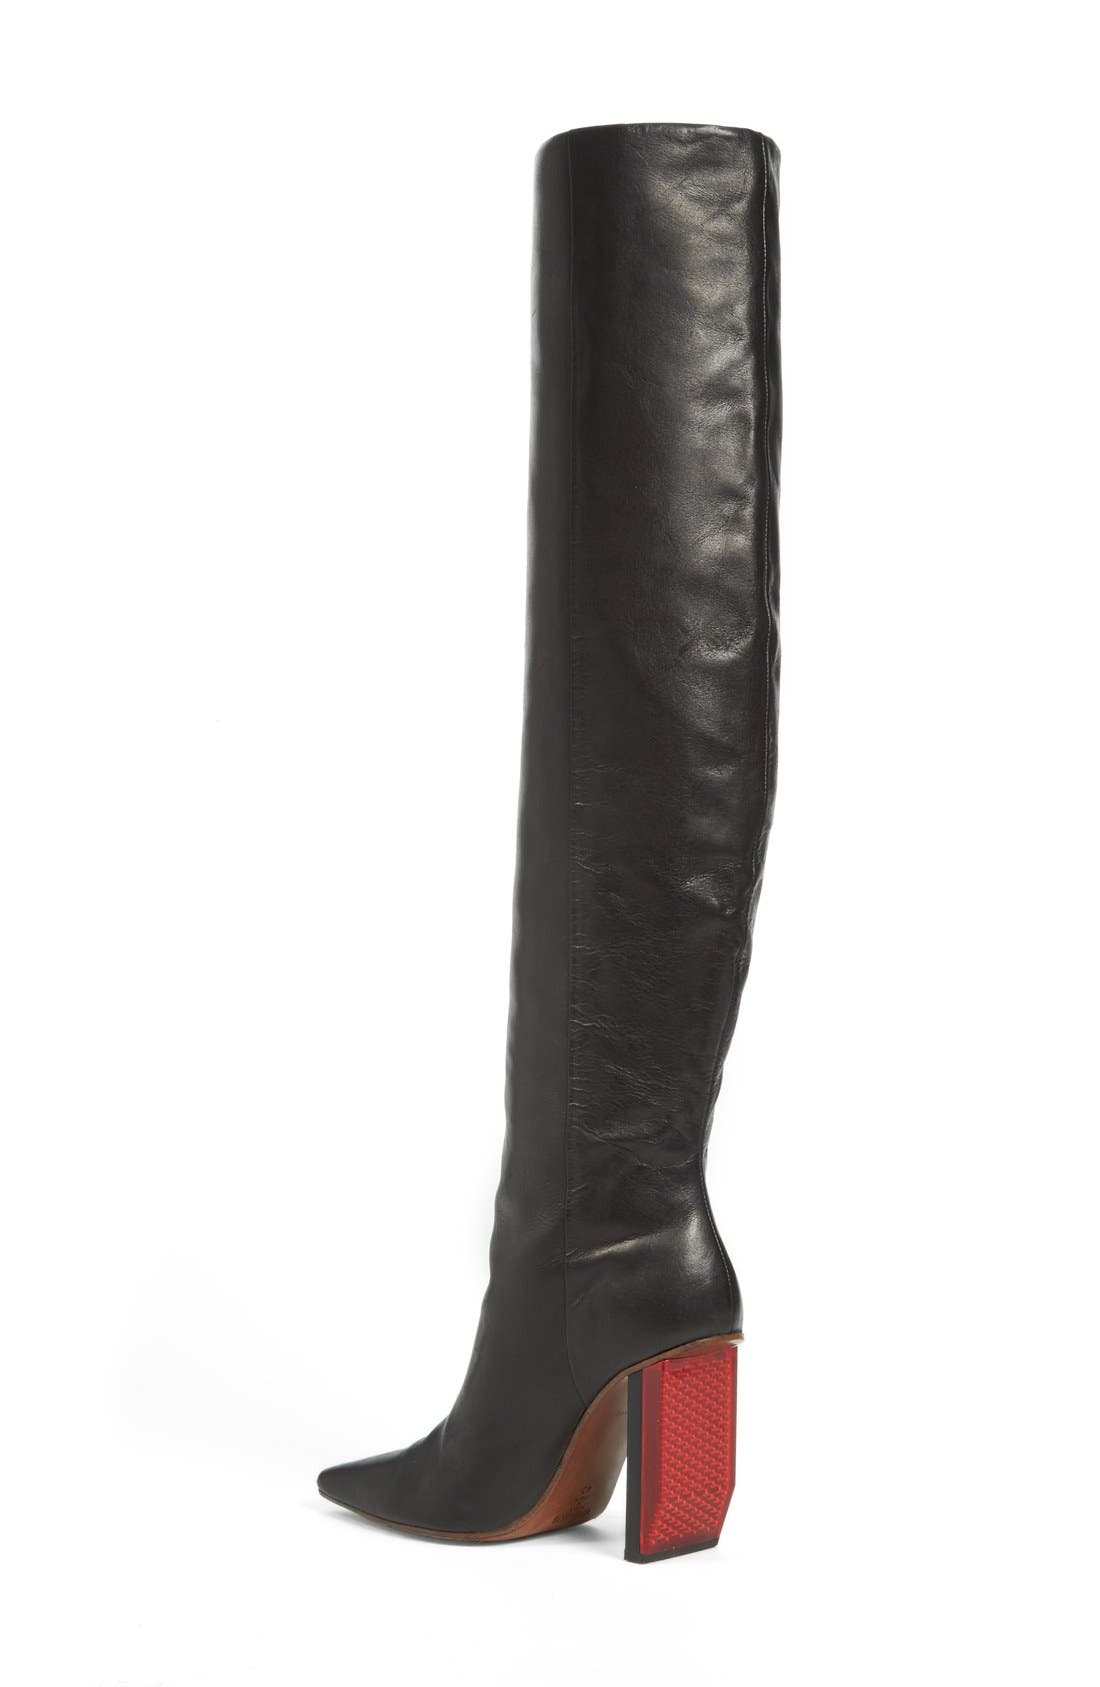 Reflector Heel Knee High Boot,                             Alternate thumbnail 2, color,                             001